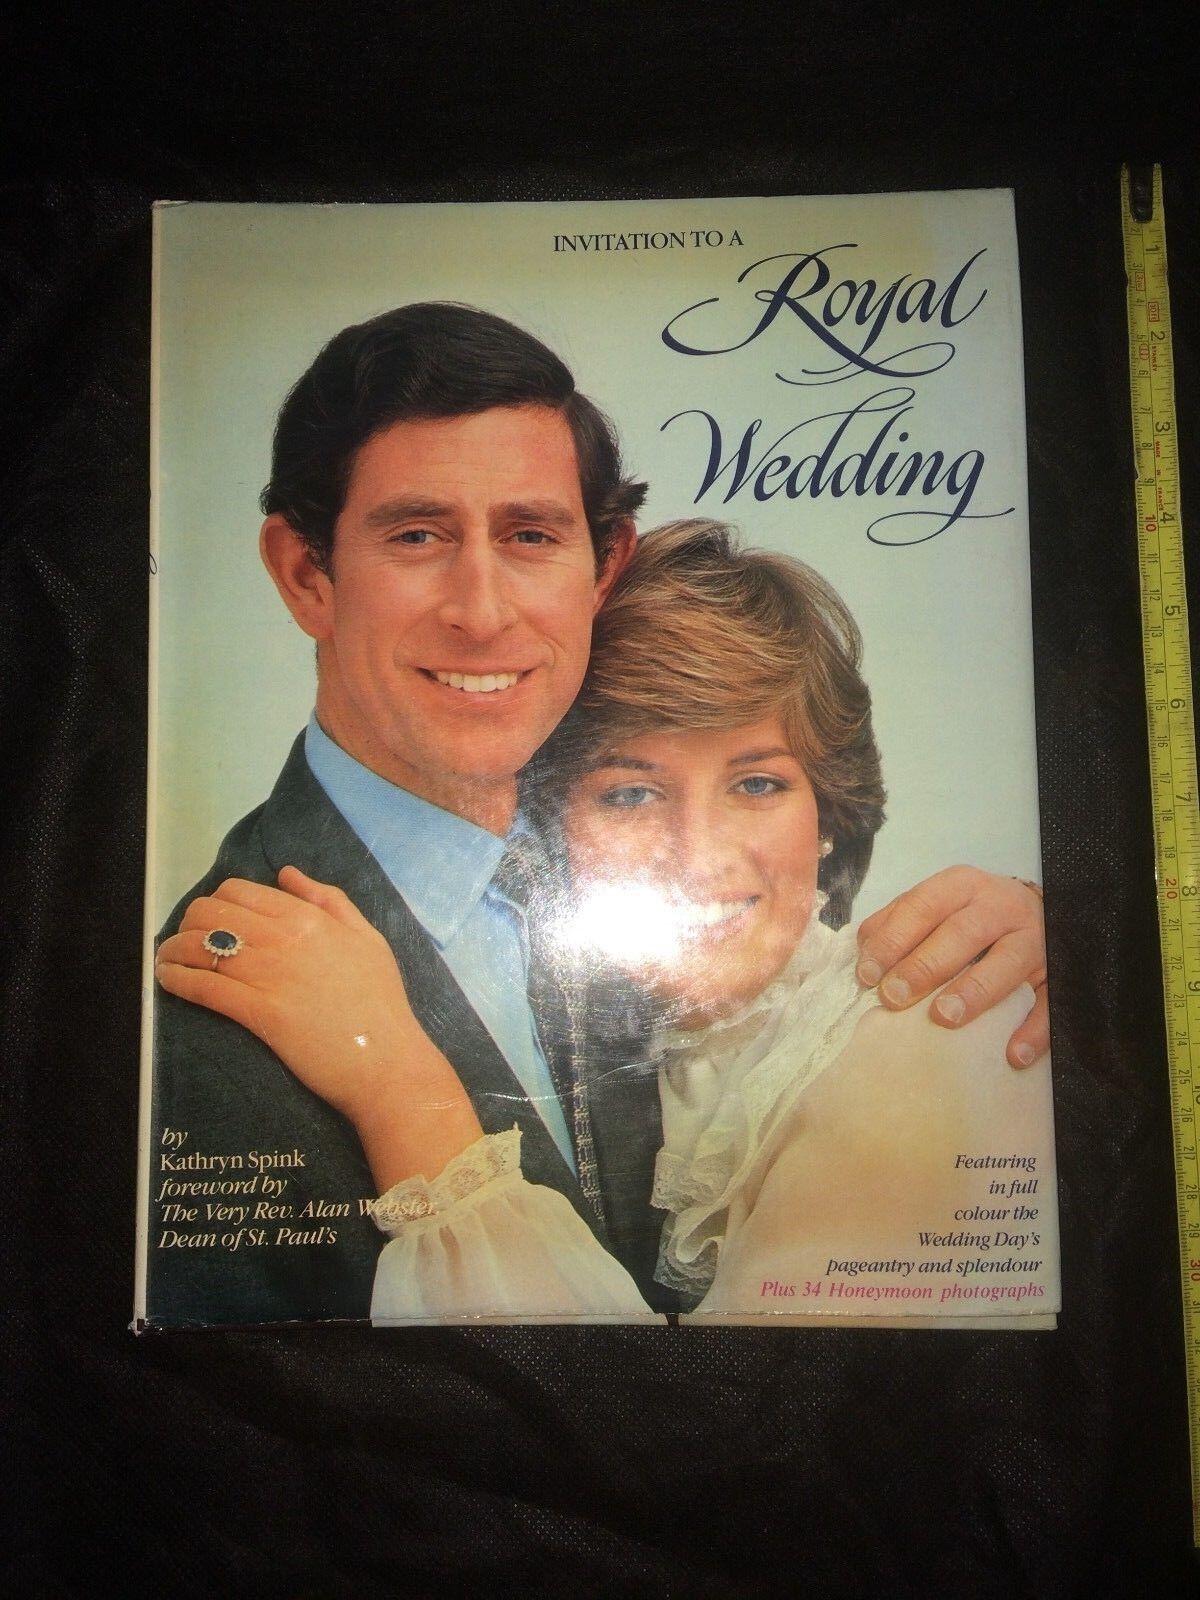 Invitation to a Royal Wedding by Kathryn Spink hardback book - Lady Diana